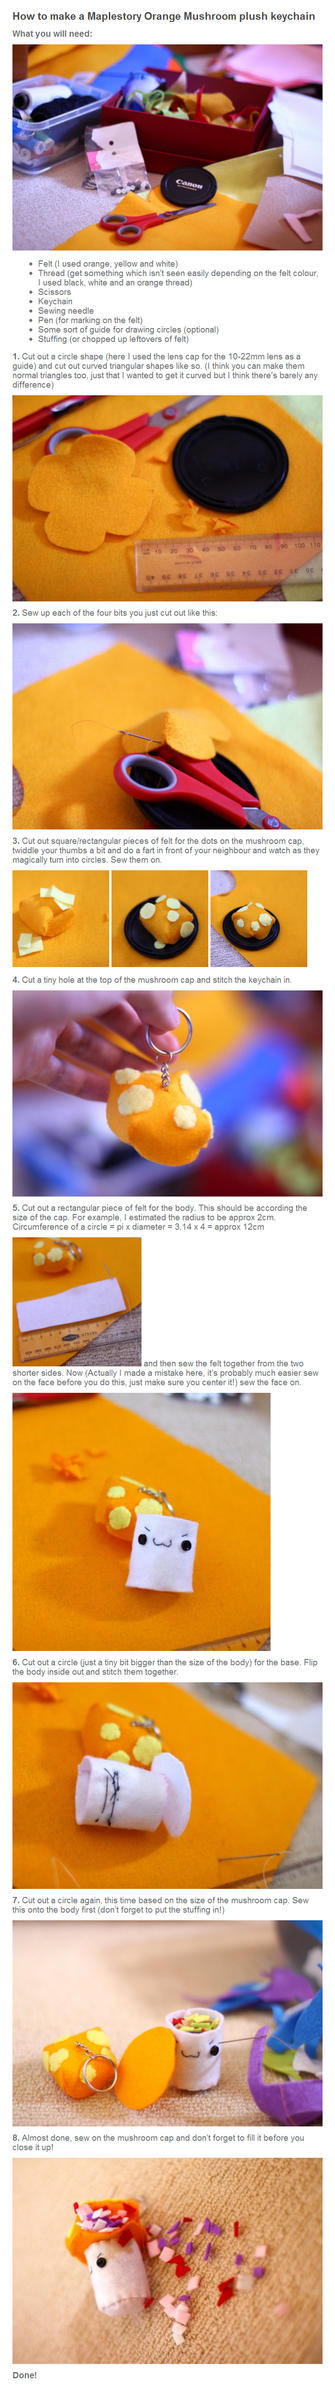 Tutorial: Orange mushroom plush by username0hi0